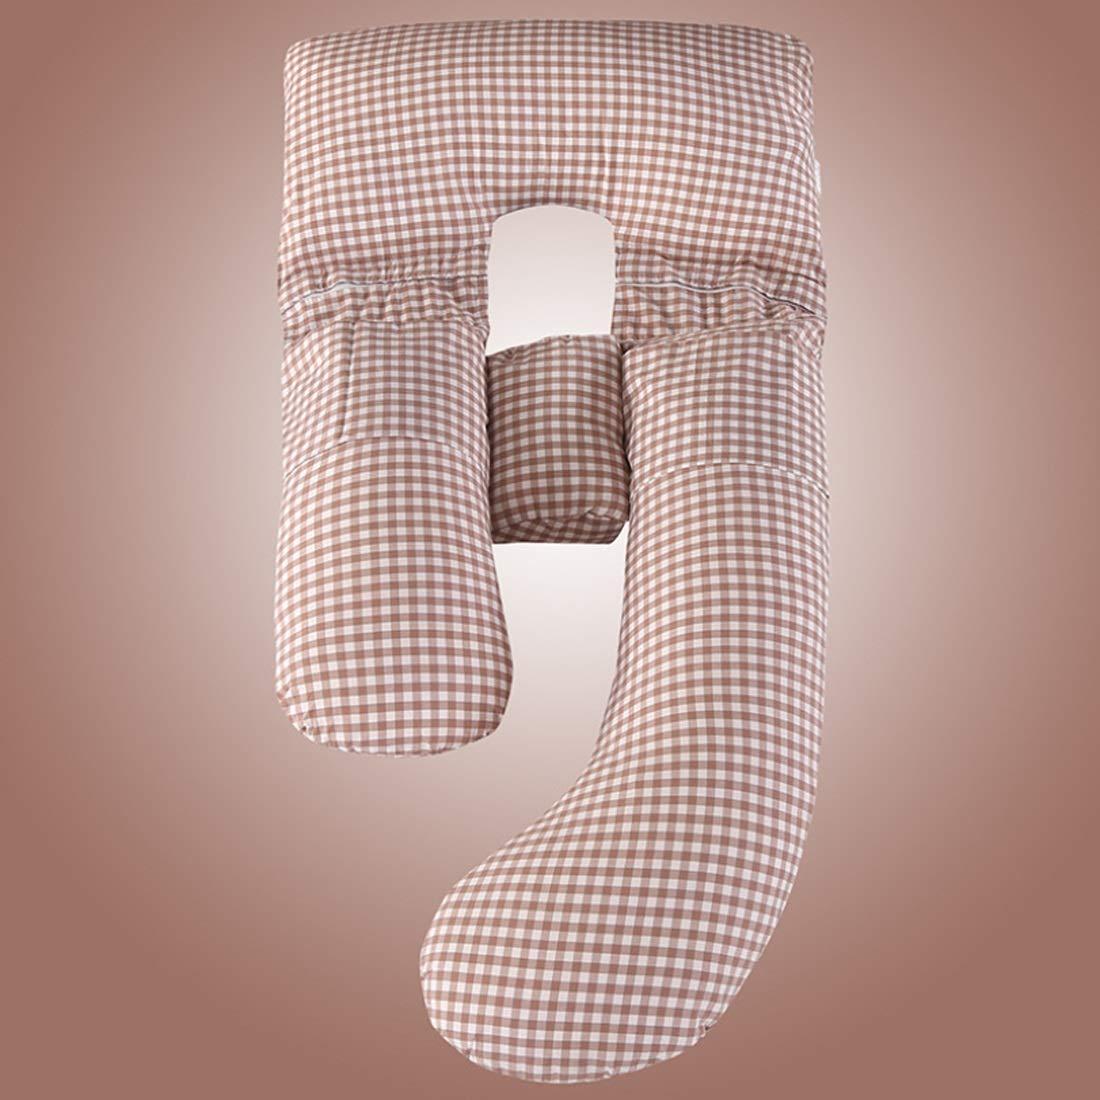 Yammucha Ganzkörper-Schwangerschaftskissen - Mutterschaftskissen für Schwangere Frauen - U-förmiges Körperkissen (Farbe (Farbe Körperkissen   Dark Blau) d49eed